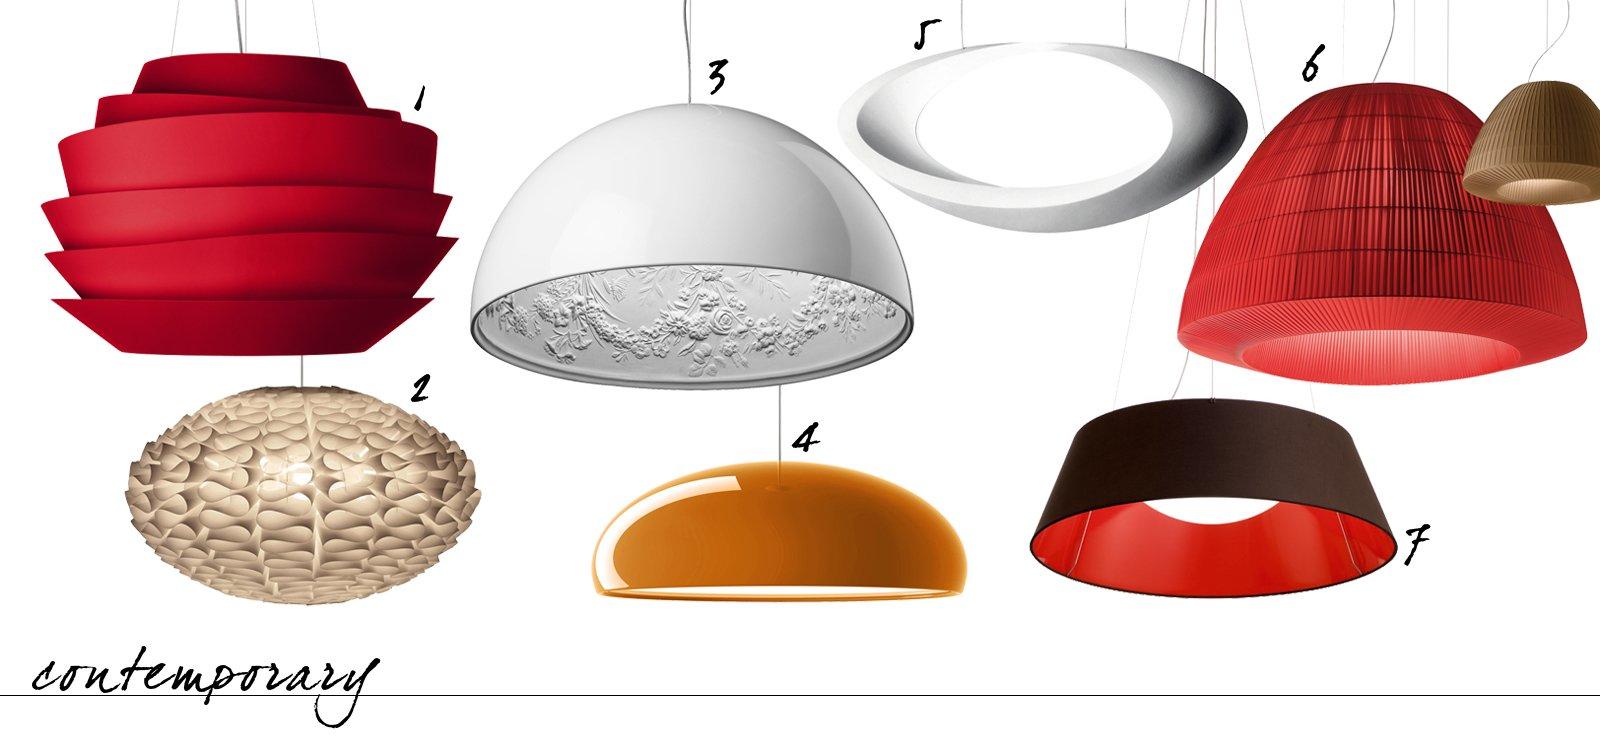 Lampade e lampadari a sospensione in tre stili diversi cose di casa - Lampadari da interno ...